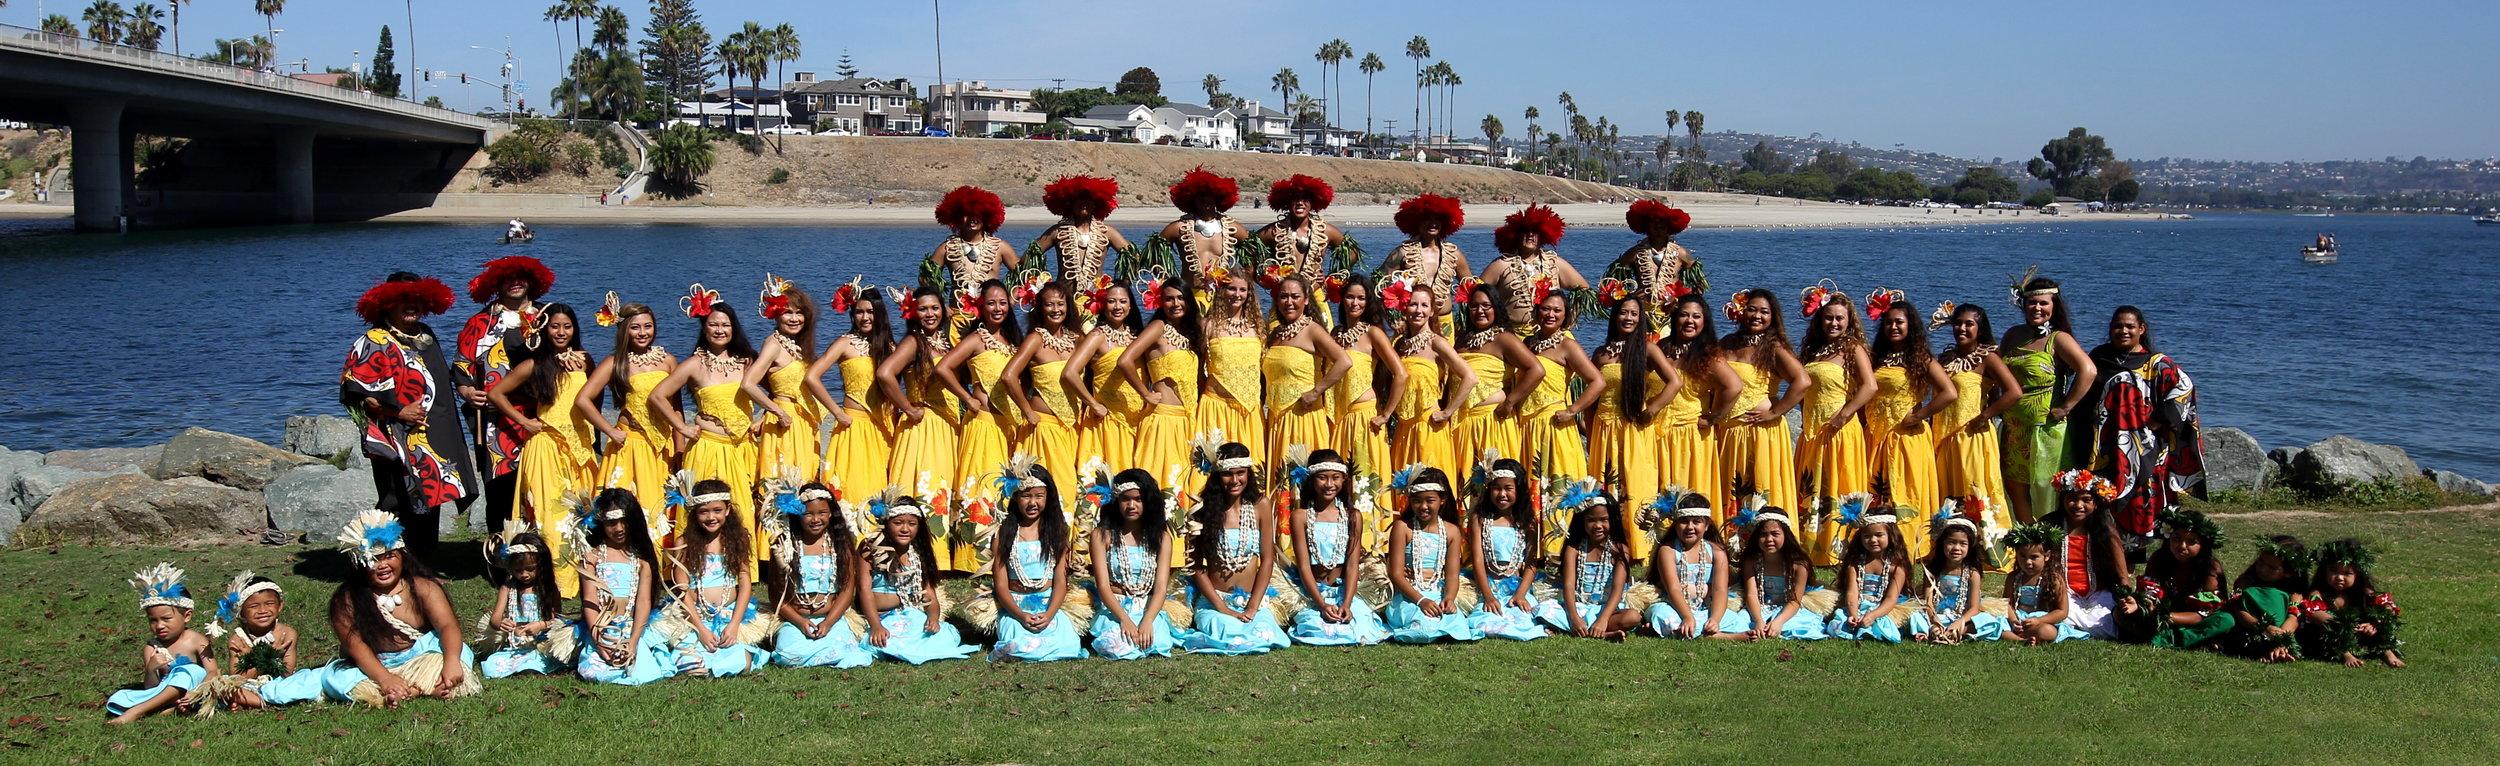 The Motu Nehenehe Polynesian Dancers at PIFA in San Diego.